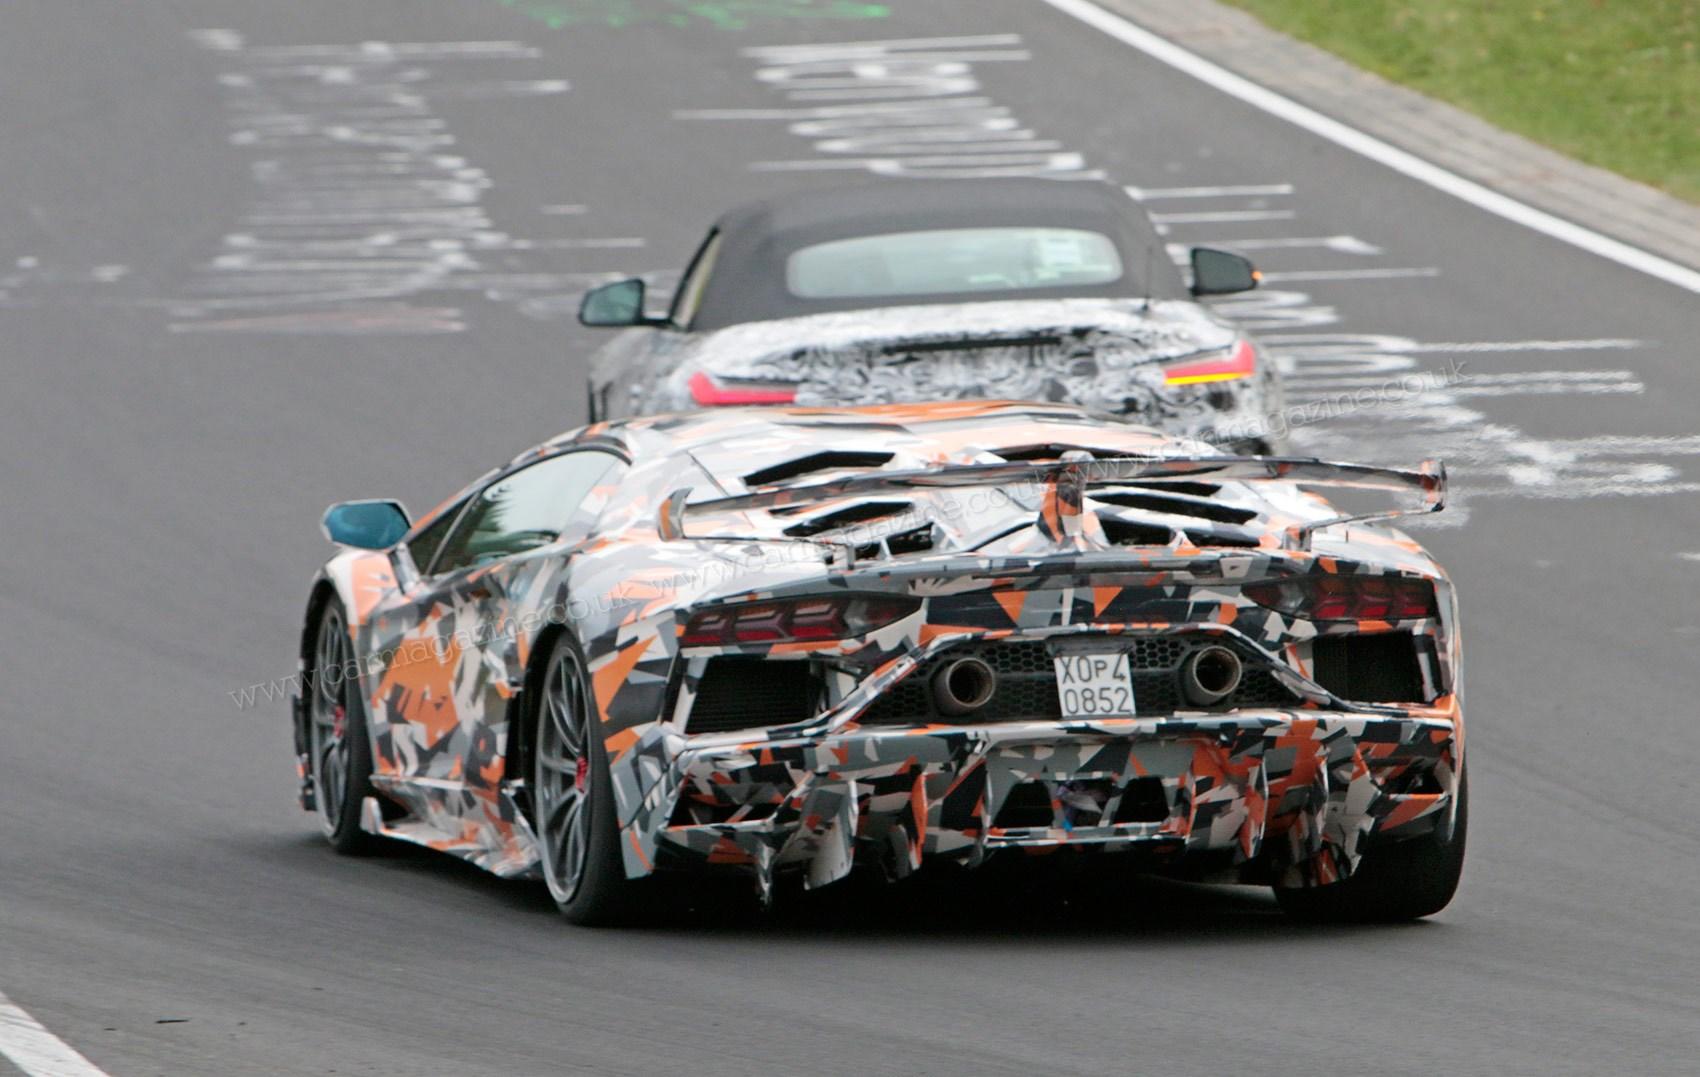 Lamborghini Aventador Sv Jota 2019 Coupe And Roadster